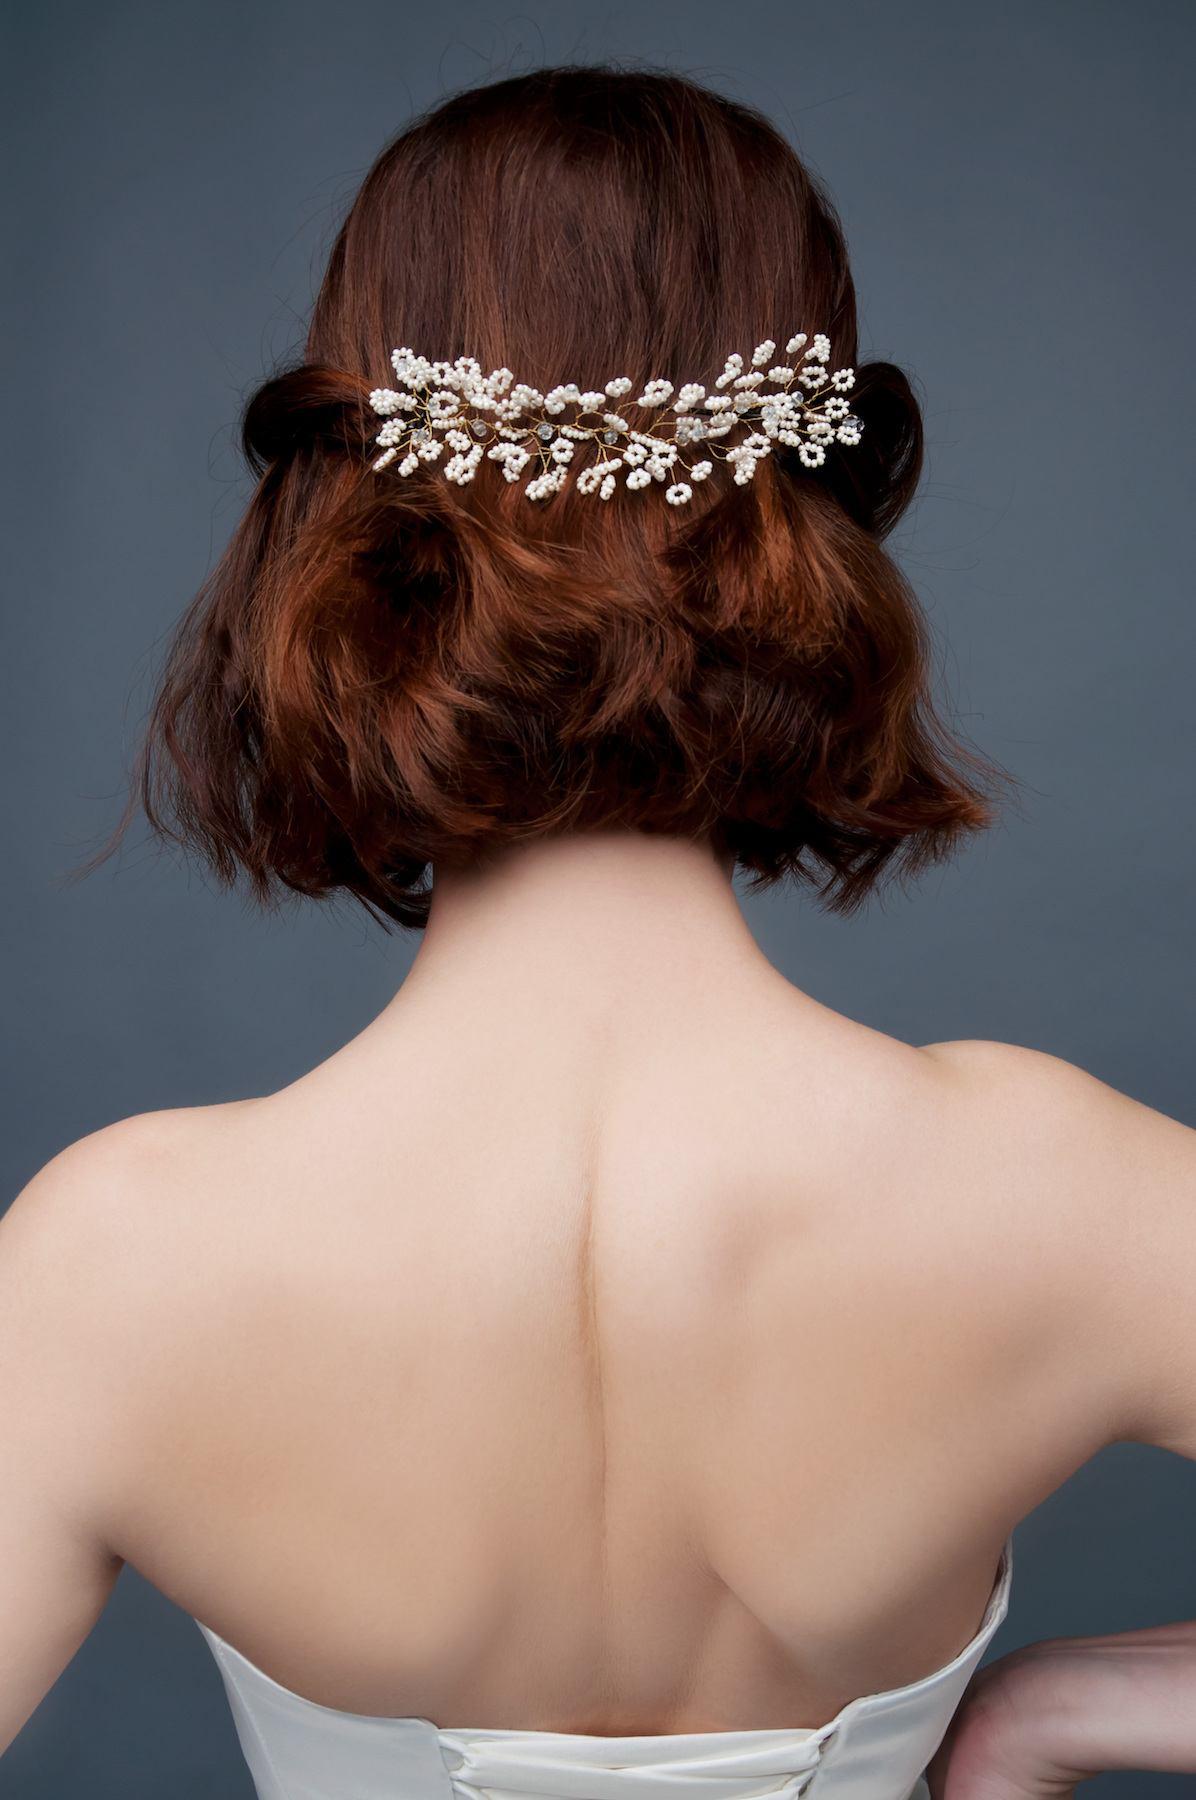 Wanita kaukasia dengan model rambut wavy messy dan aksesoris